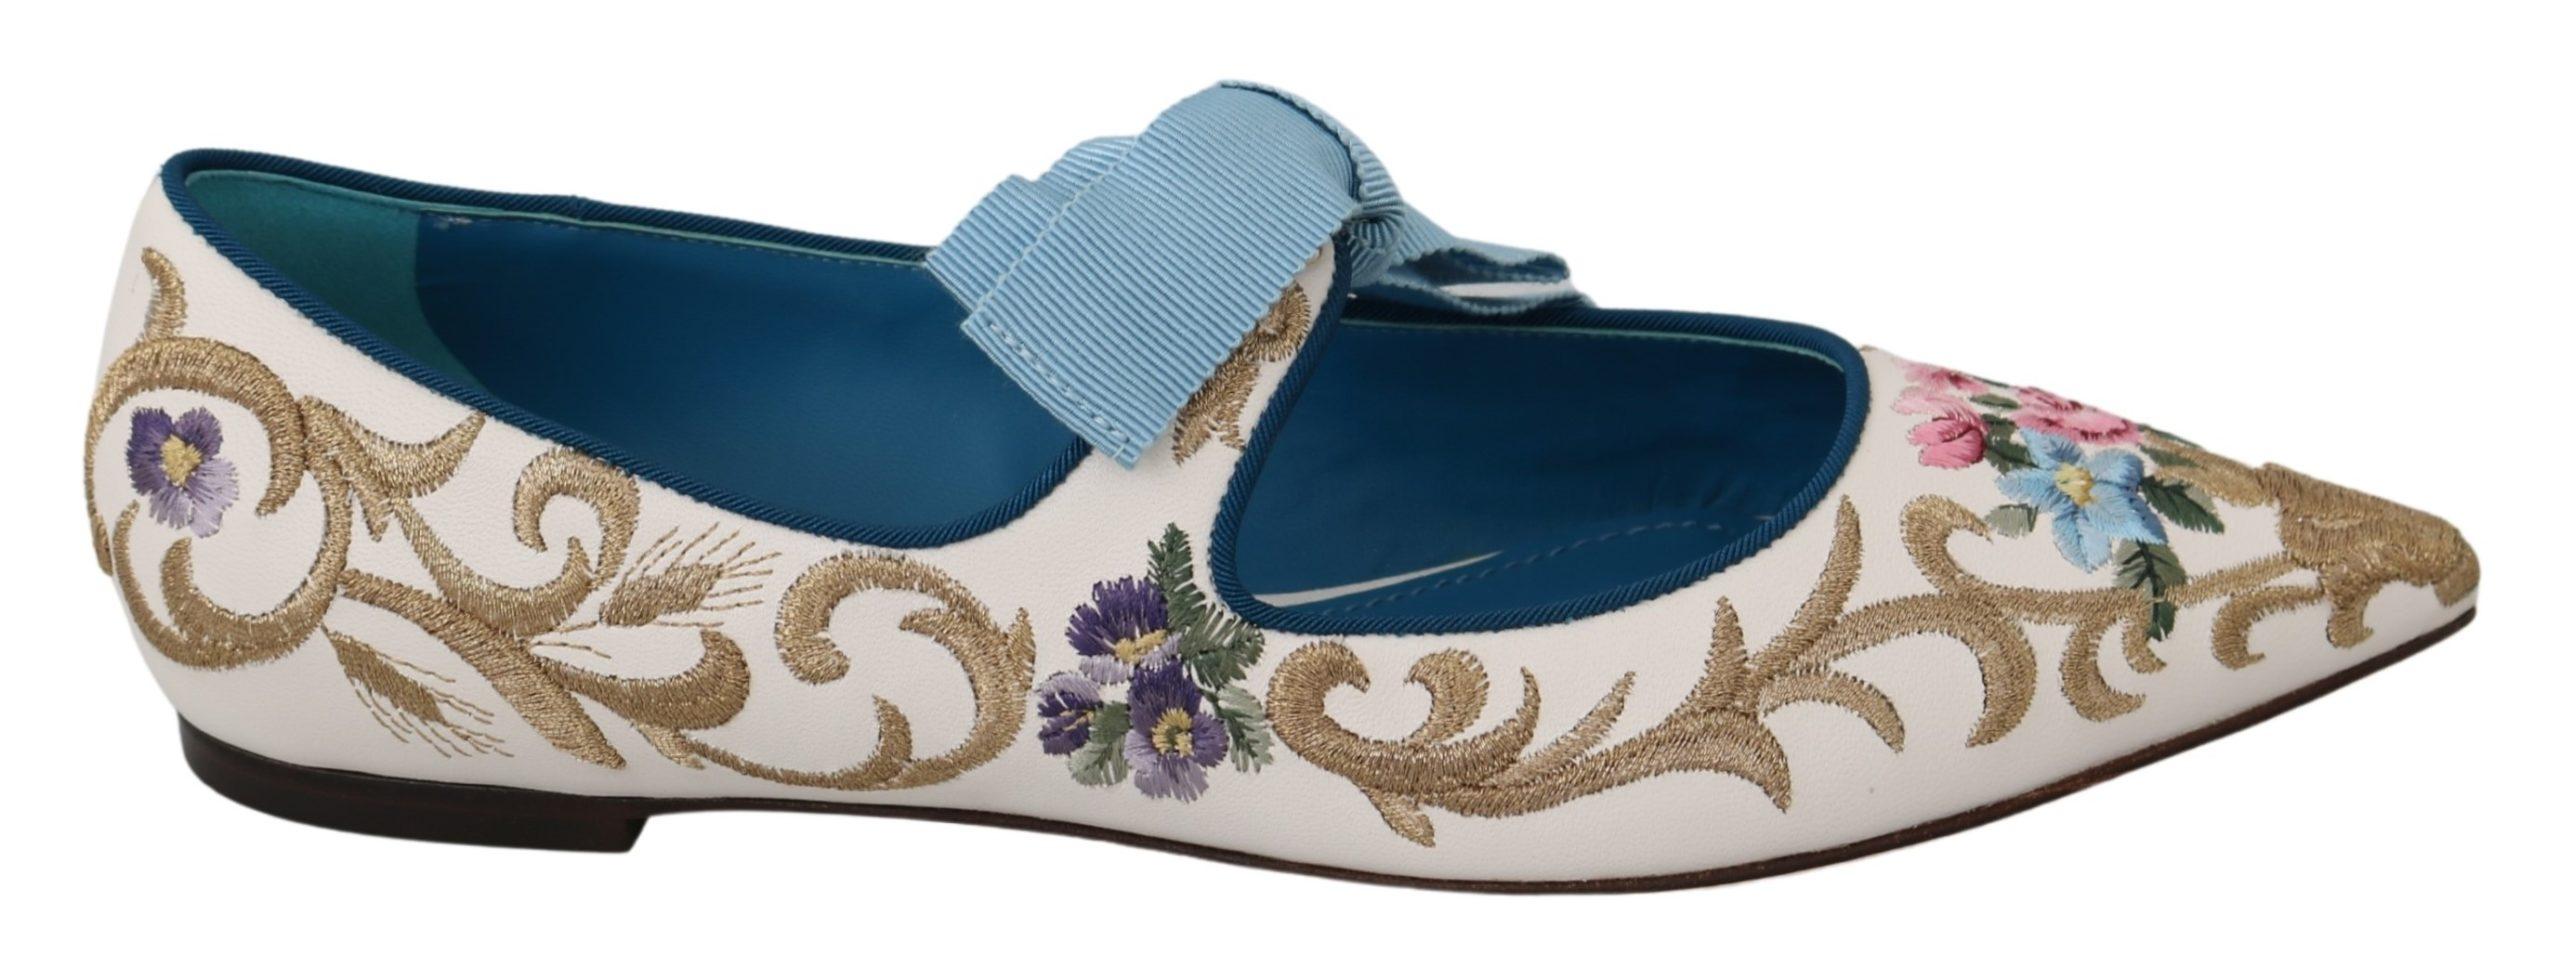 Dolce & Gabbana Women's Floral Ballerina Leather Flat Shoe White LA7037 - EU39/US8.5